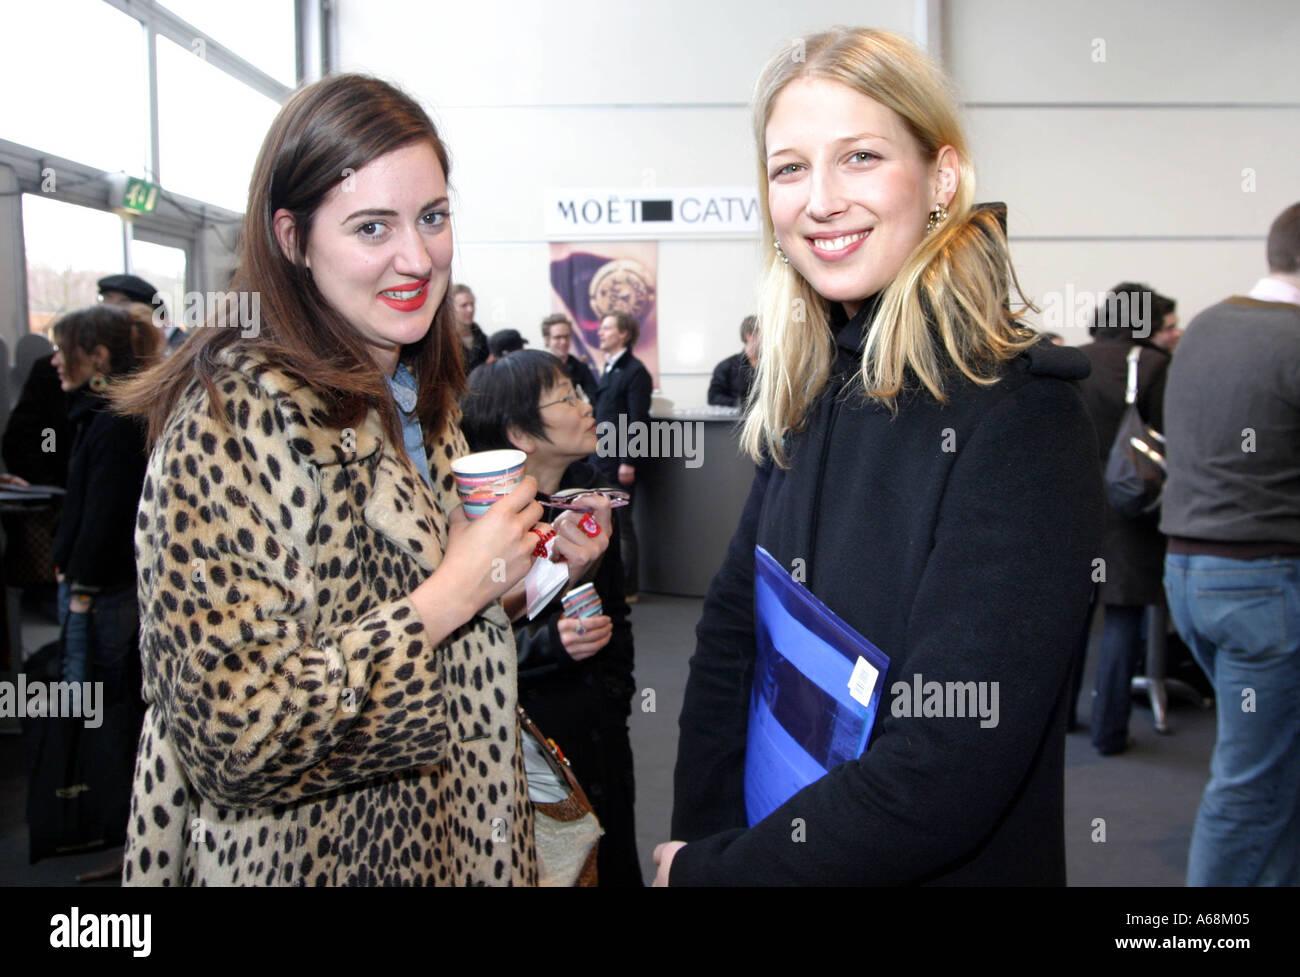 F.A.M.E. Team Head Backstage at London Fashion Week